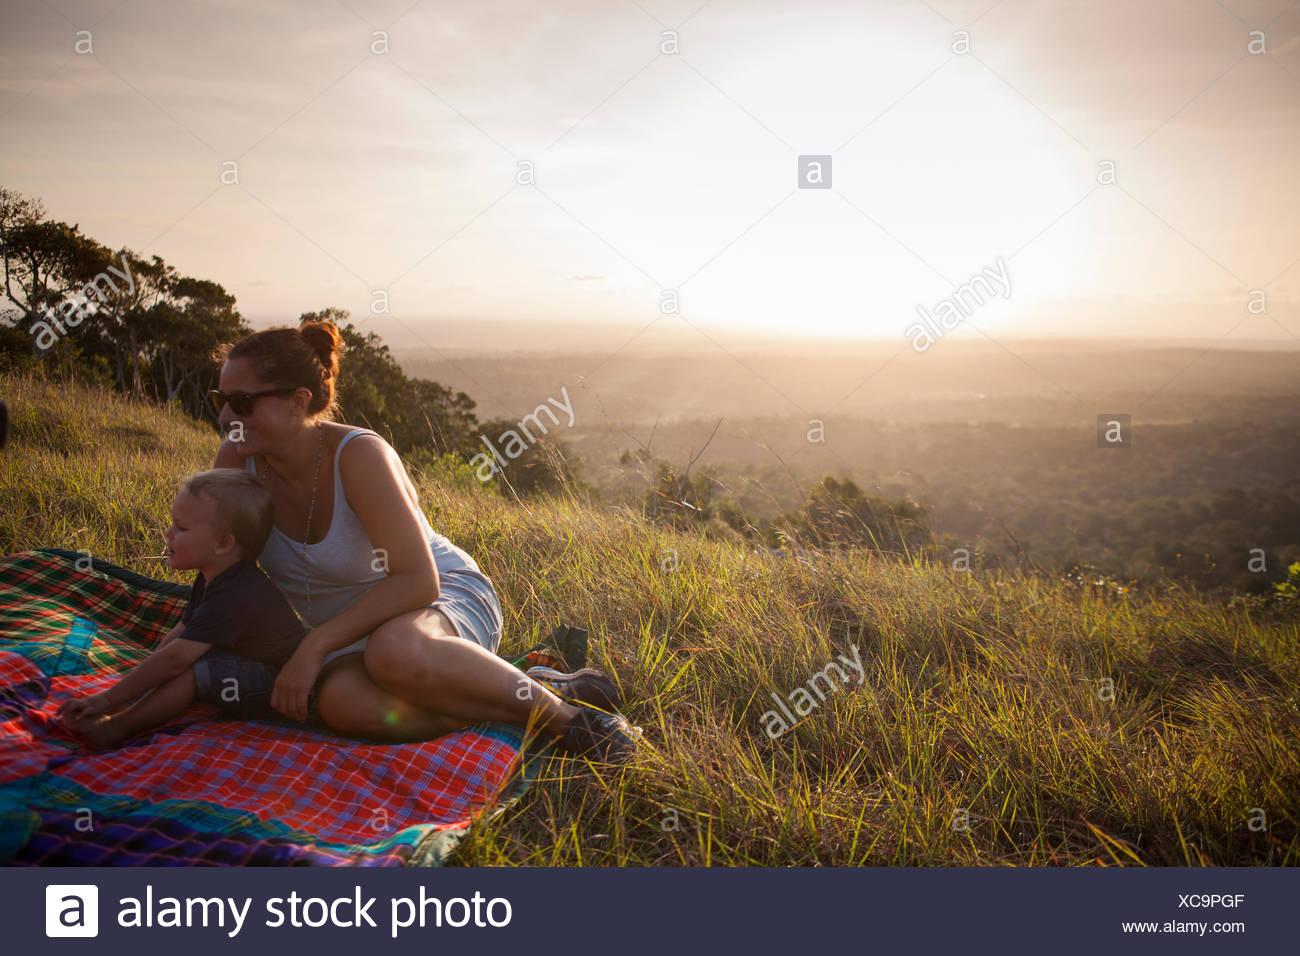 Madre e hijo sentado en un campo en Kenia Imagen De Stock